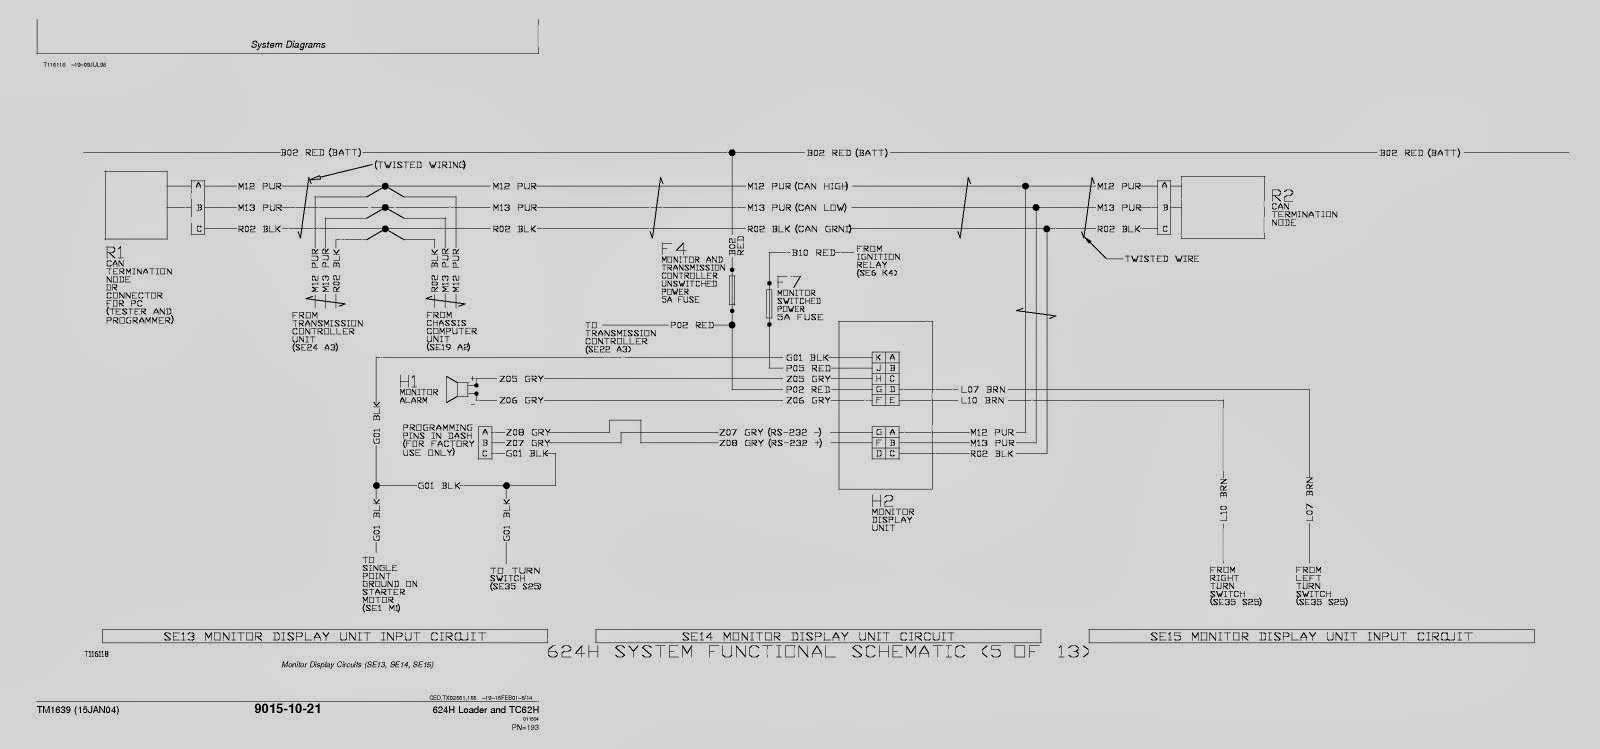 medium resolution of  john owner manual john deere 3225b on john deere parts diagrams john deere solenoid wiring